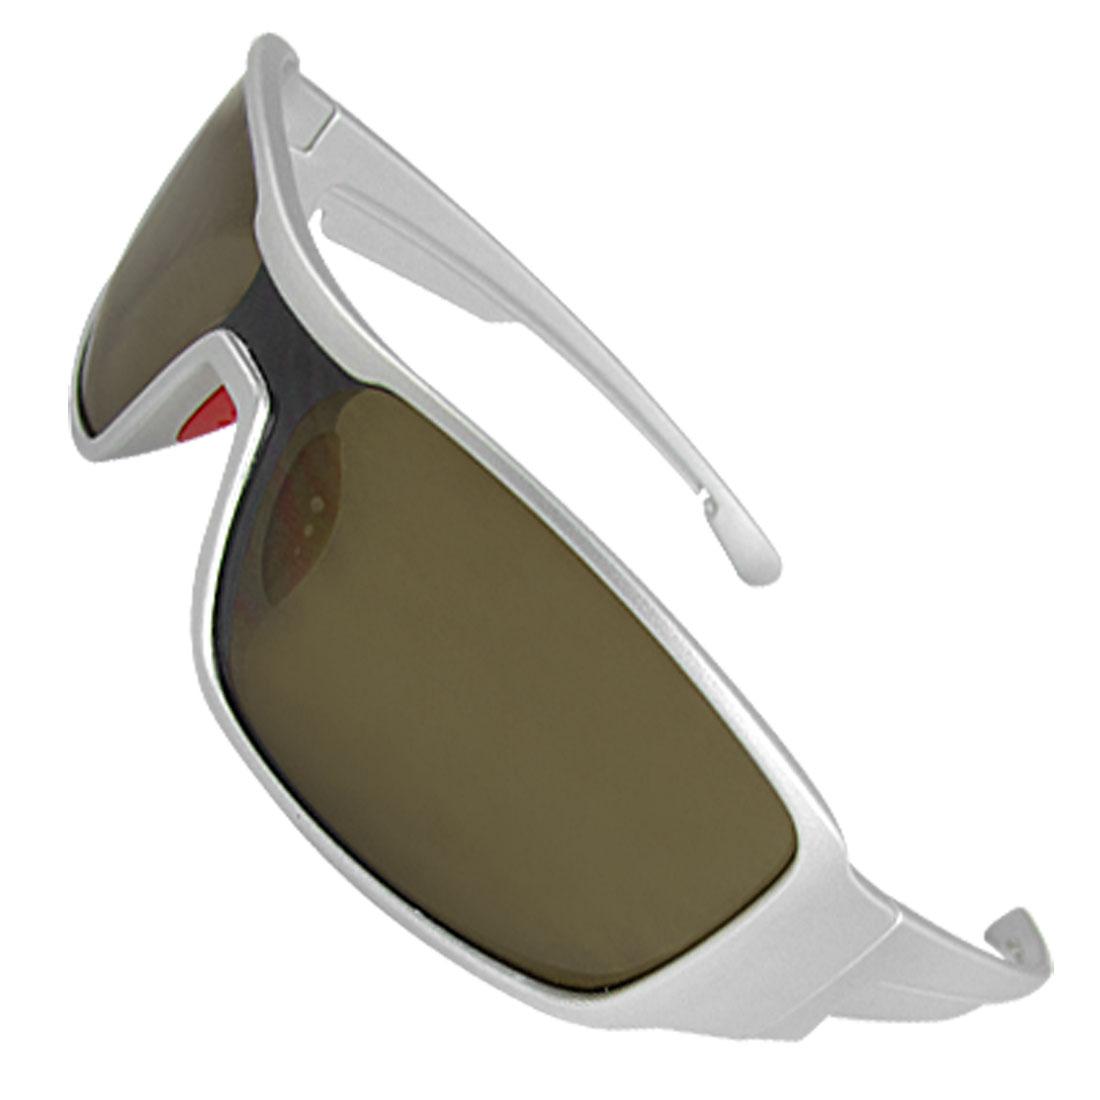 Unisex Silver Tone Plastic Arms Uni-Lens Leisure Sunglasses